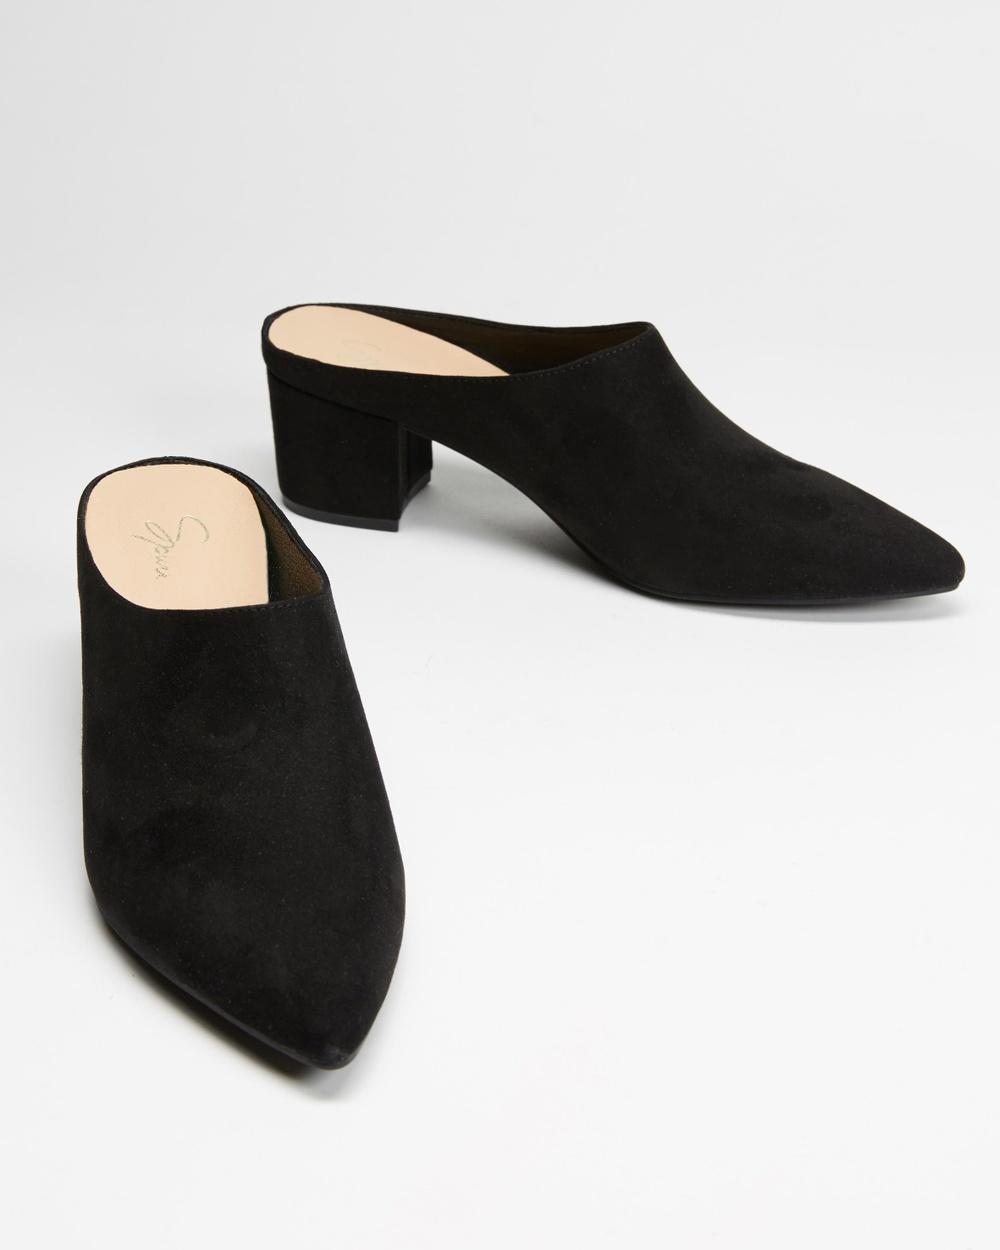 SPURR Lopez Heels Mid-low heels Black Microsuede Australia